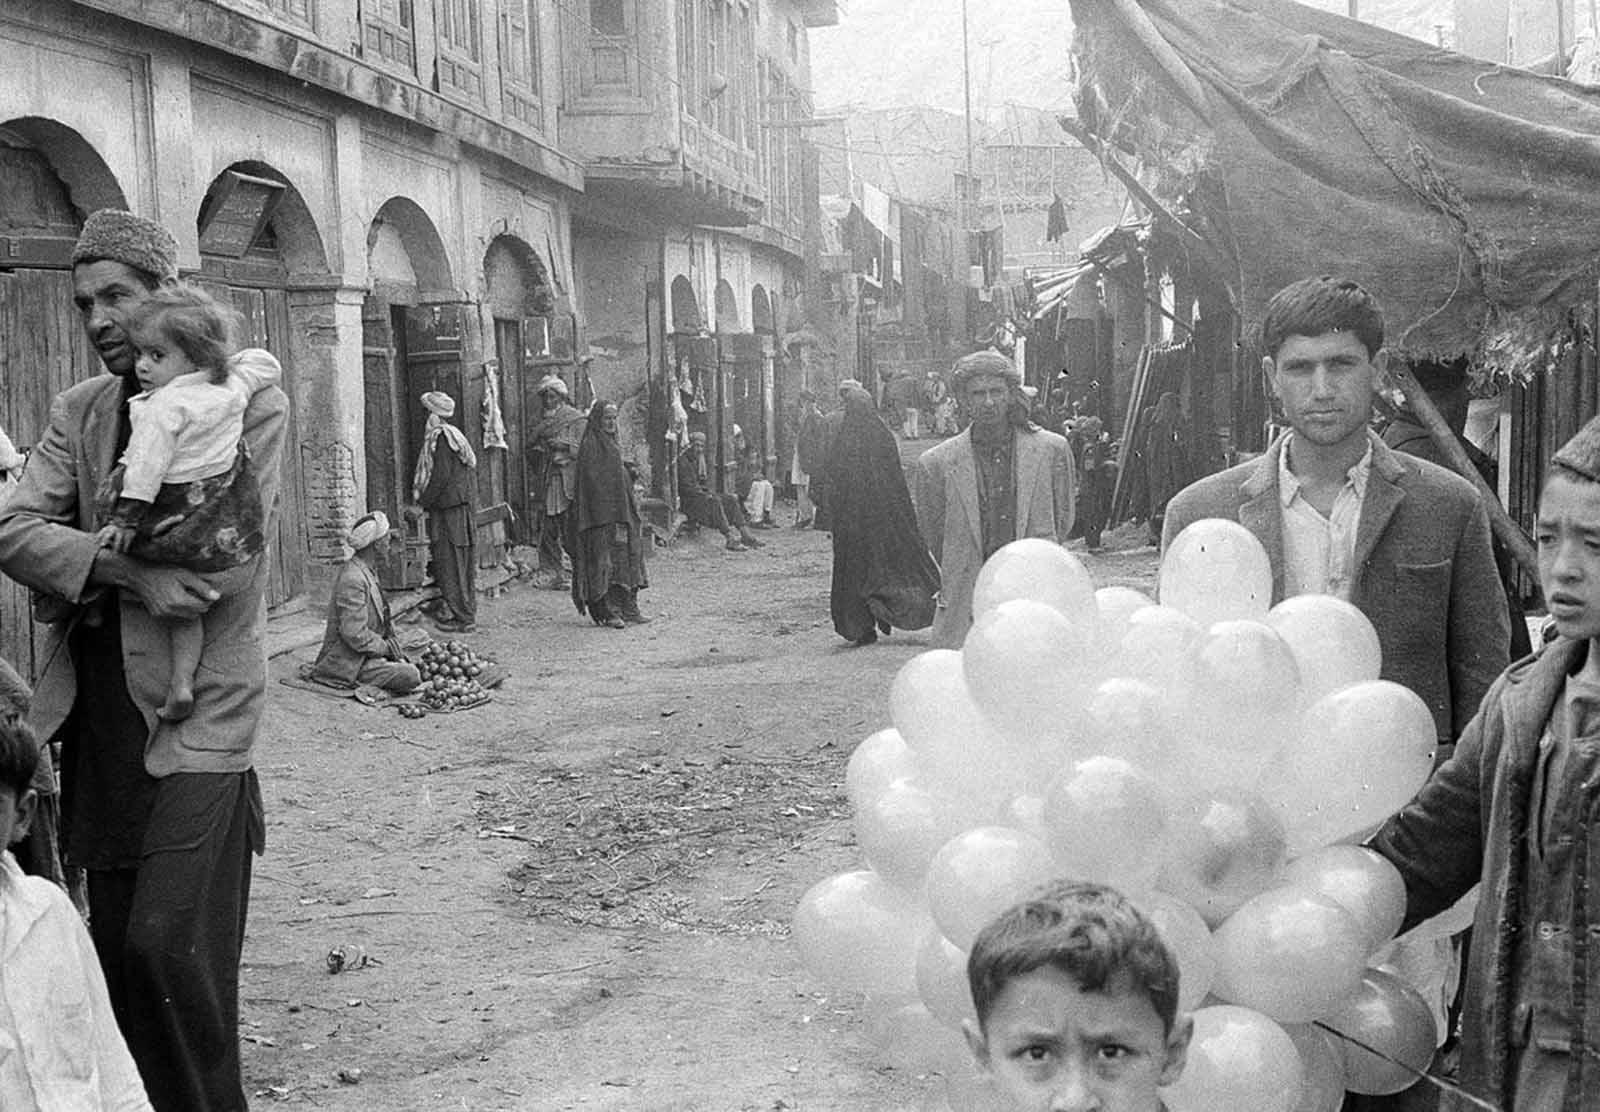 Una escena tranquila en una calle a través del bazar de Kabul, el 31 de diciembre de 1969.